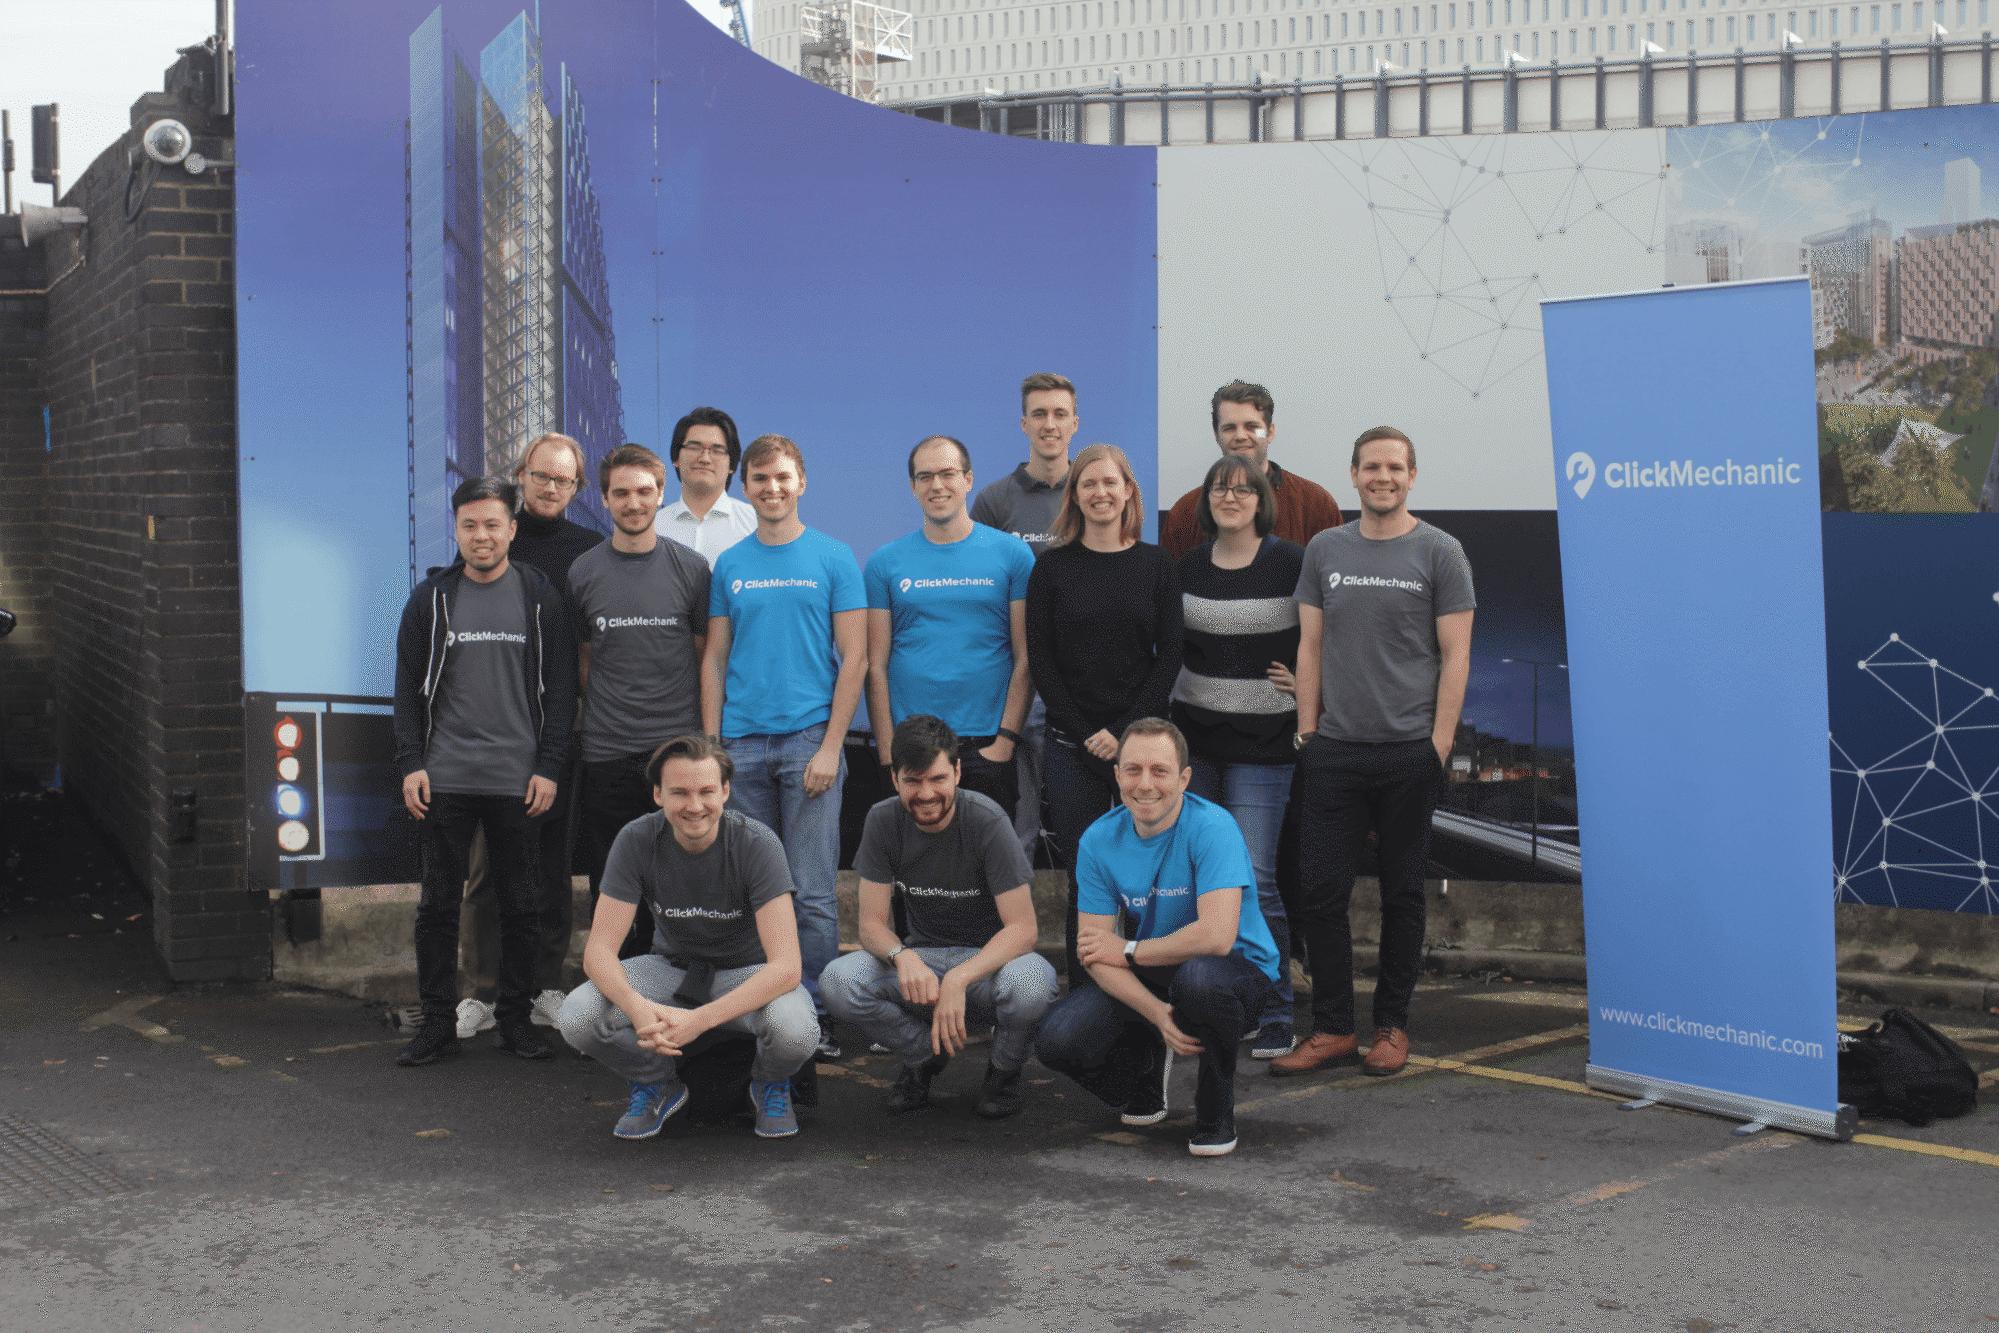 The ClickMechanic Team